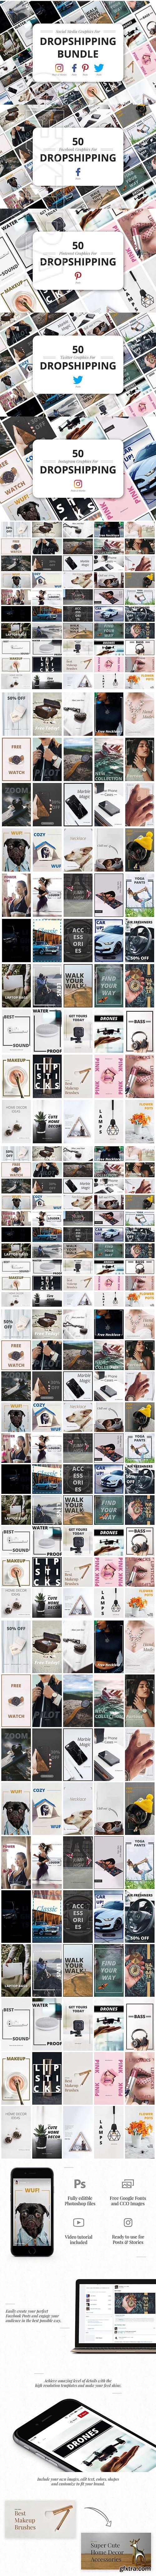 CreativeMarket - Dropshipping Graphics Bundle 2735898